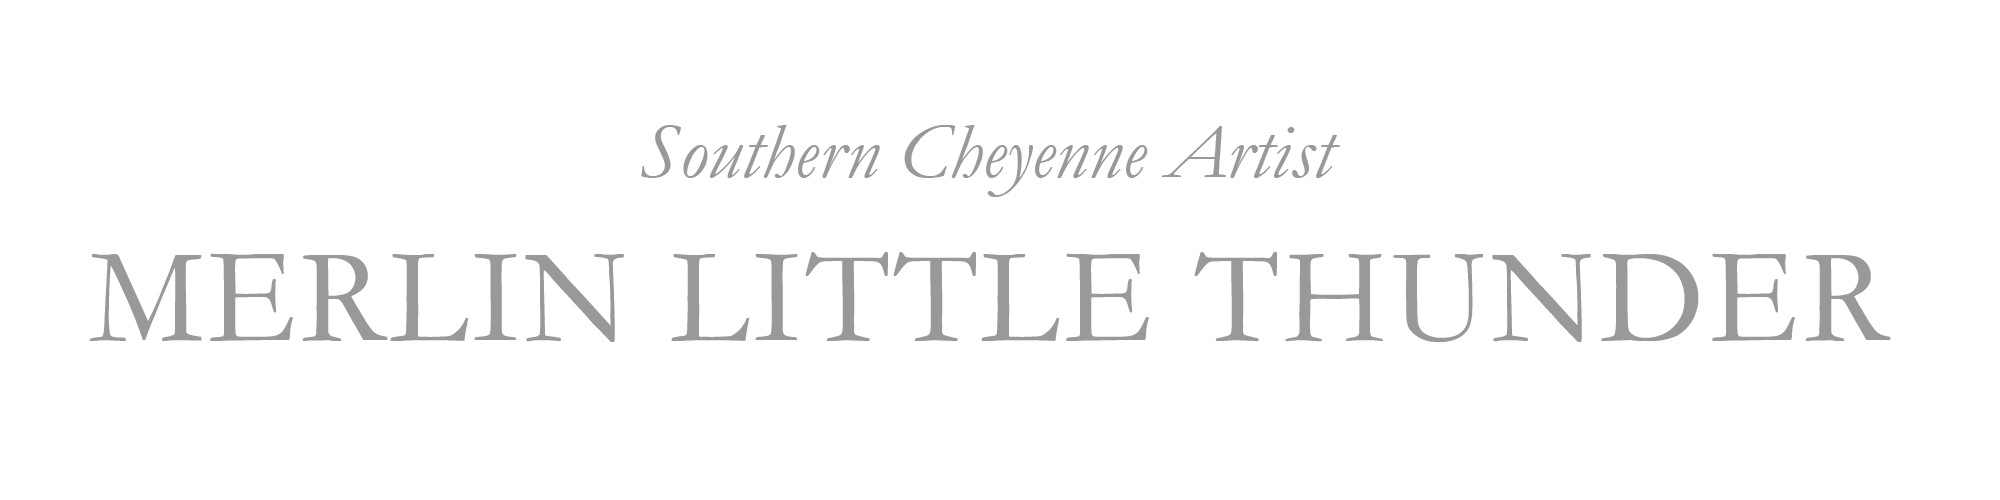 Southern Cheyenne Artist